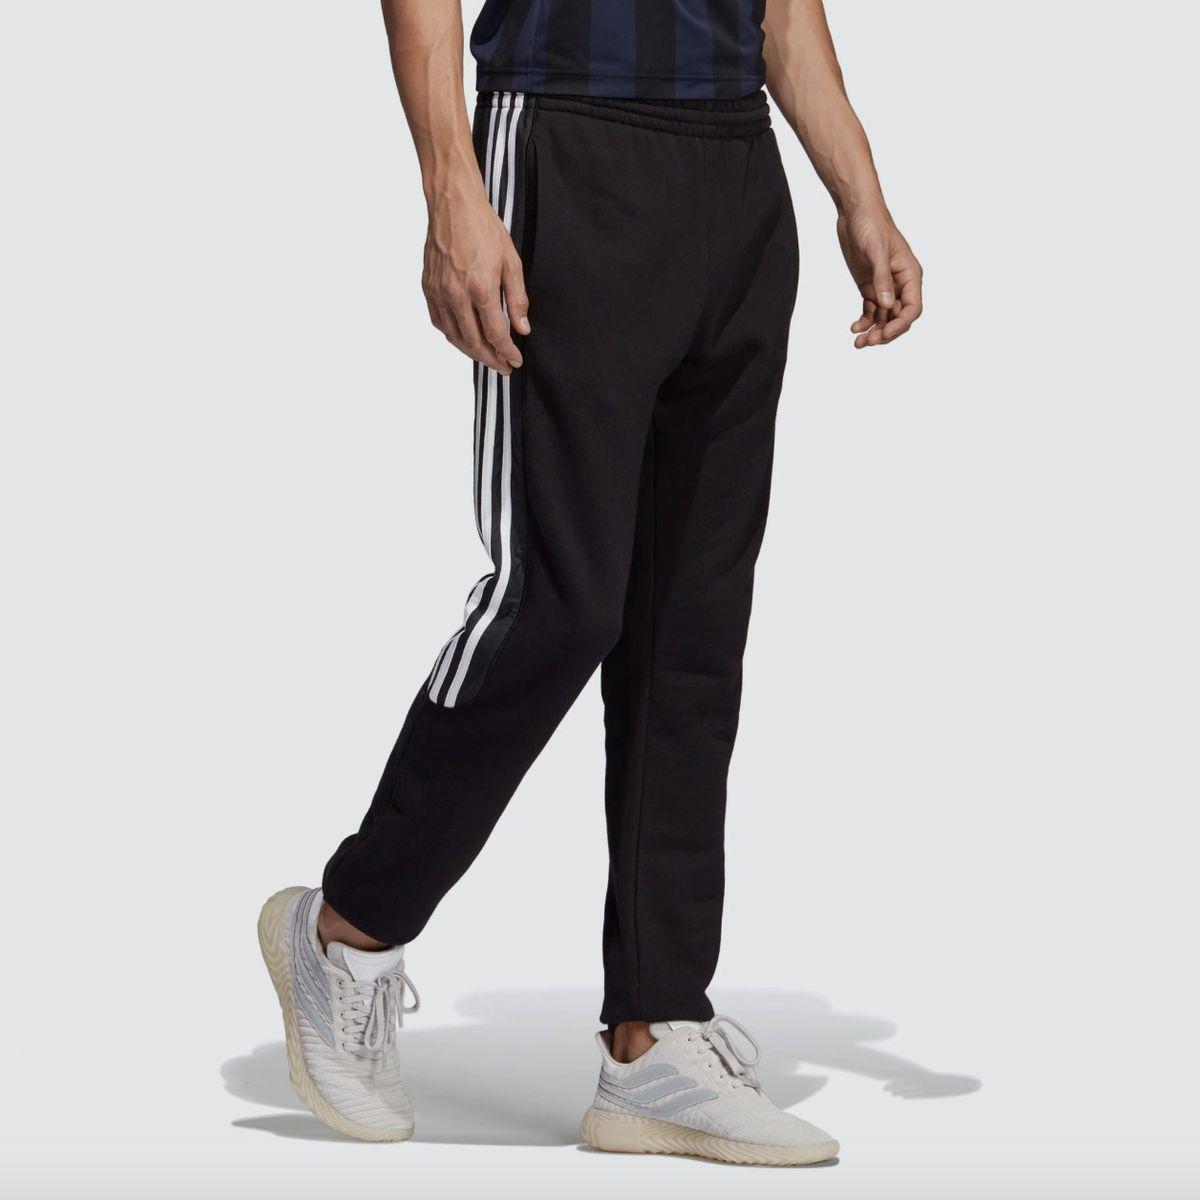 Long Sweatpants for Men Athletic Retro Style Bermuda Silhouette 100/% Cotton Sports Pants